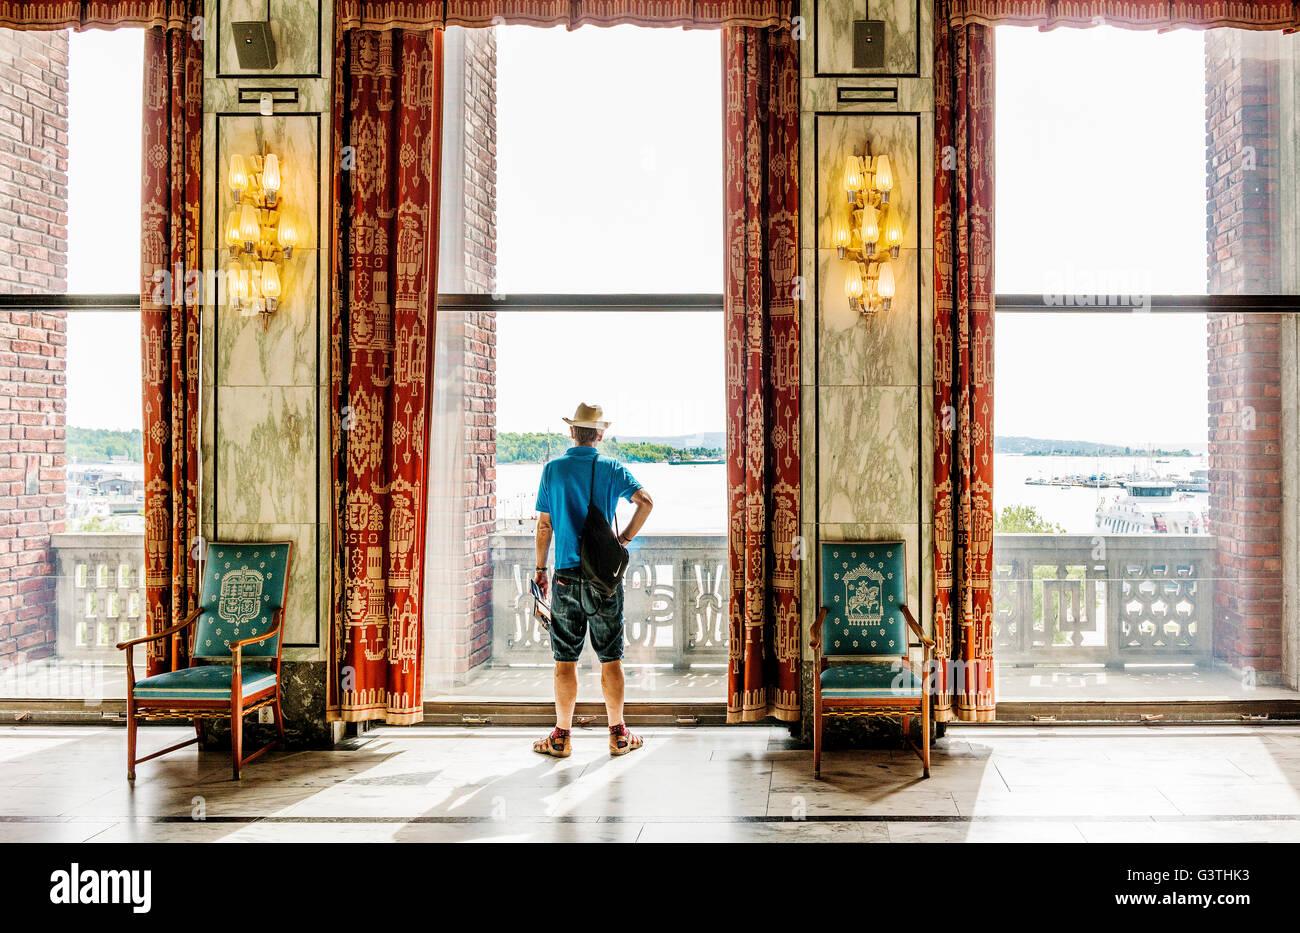 Norway, Oslo, Oslo City Hall, Tourist looking through window - Stock Image